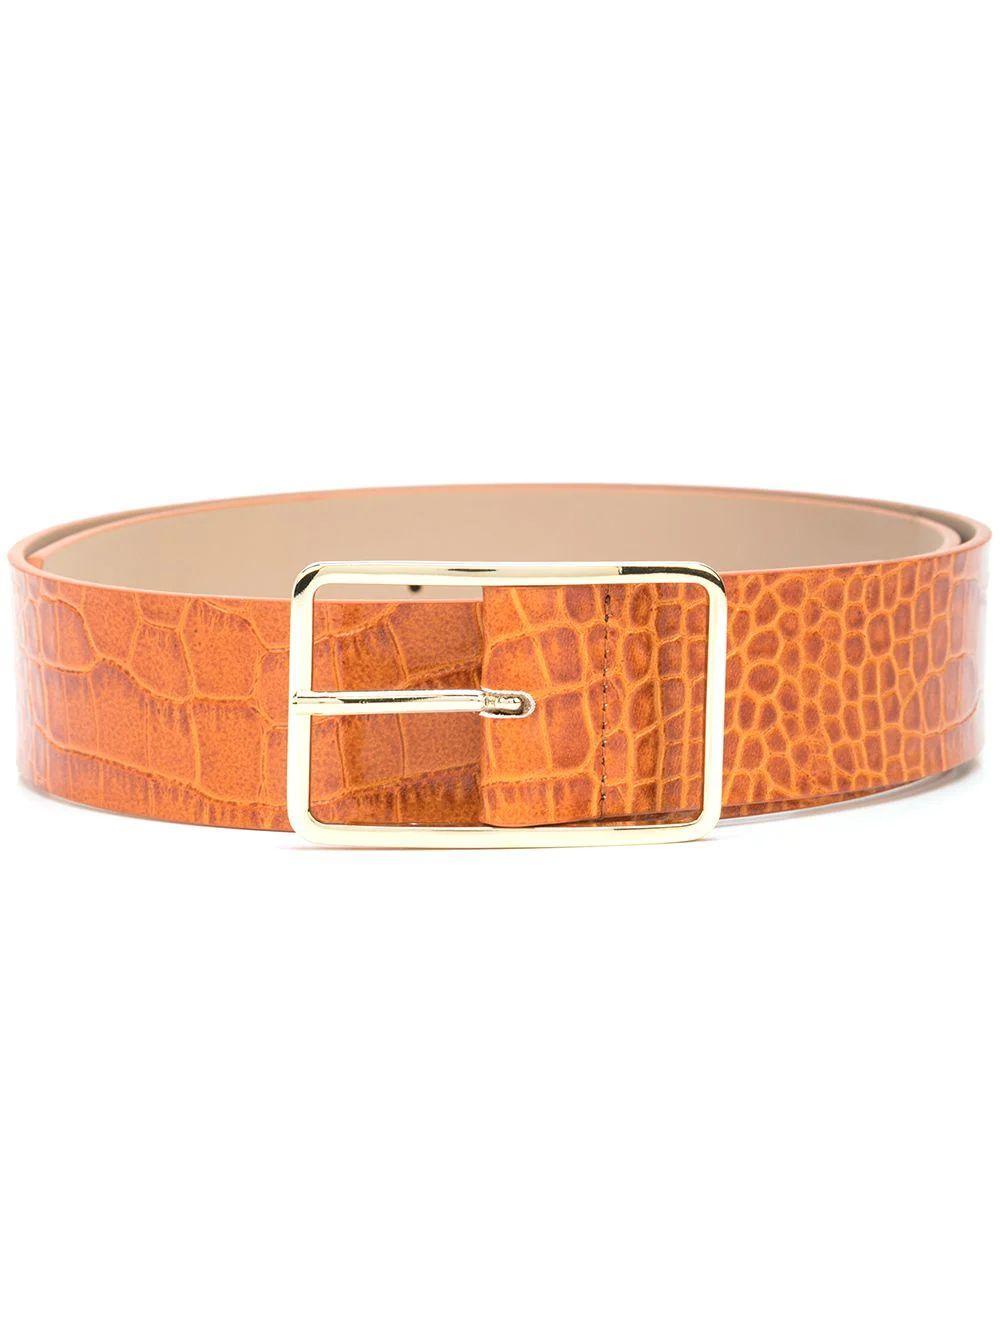 Milla Croco Belt Item # BT1640-710LE-S21